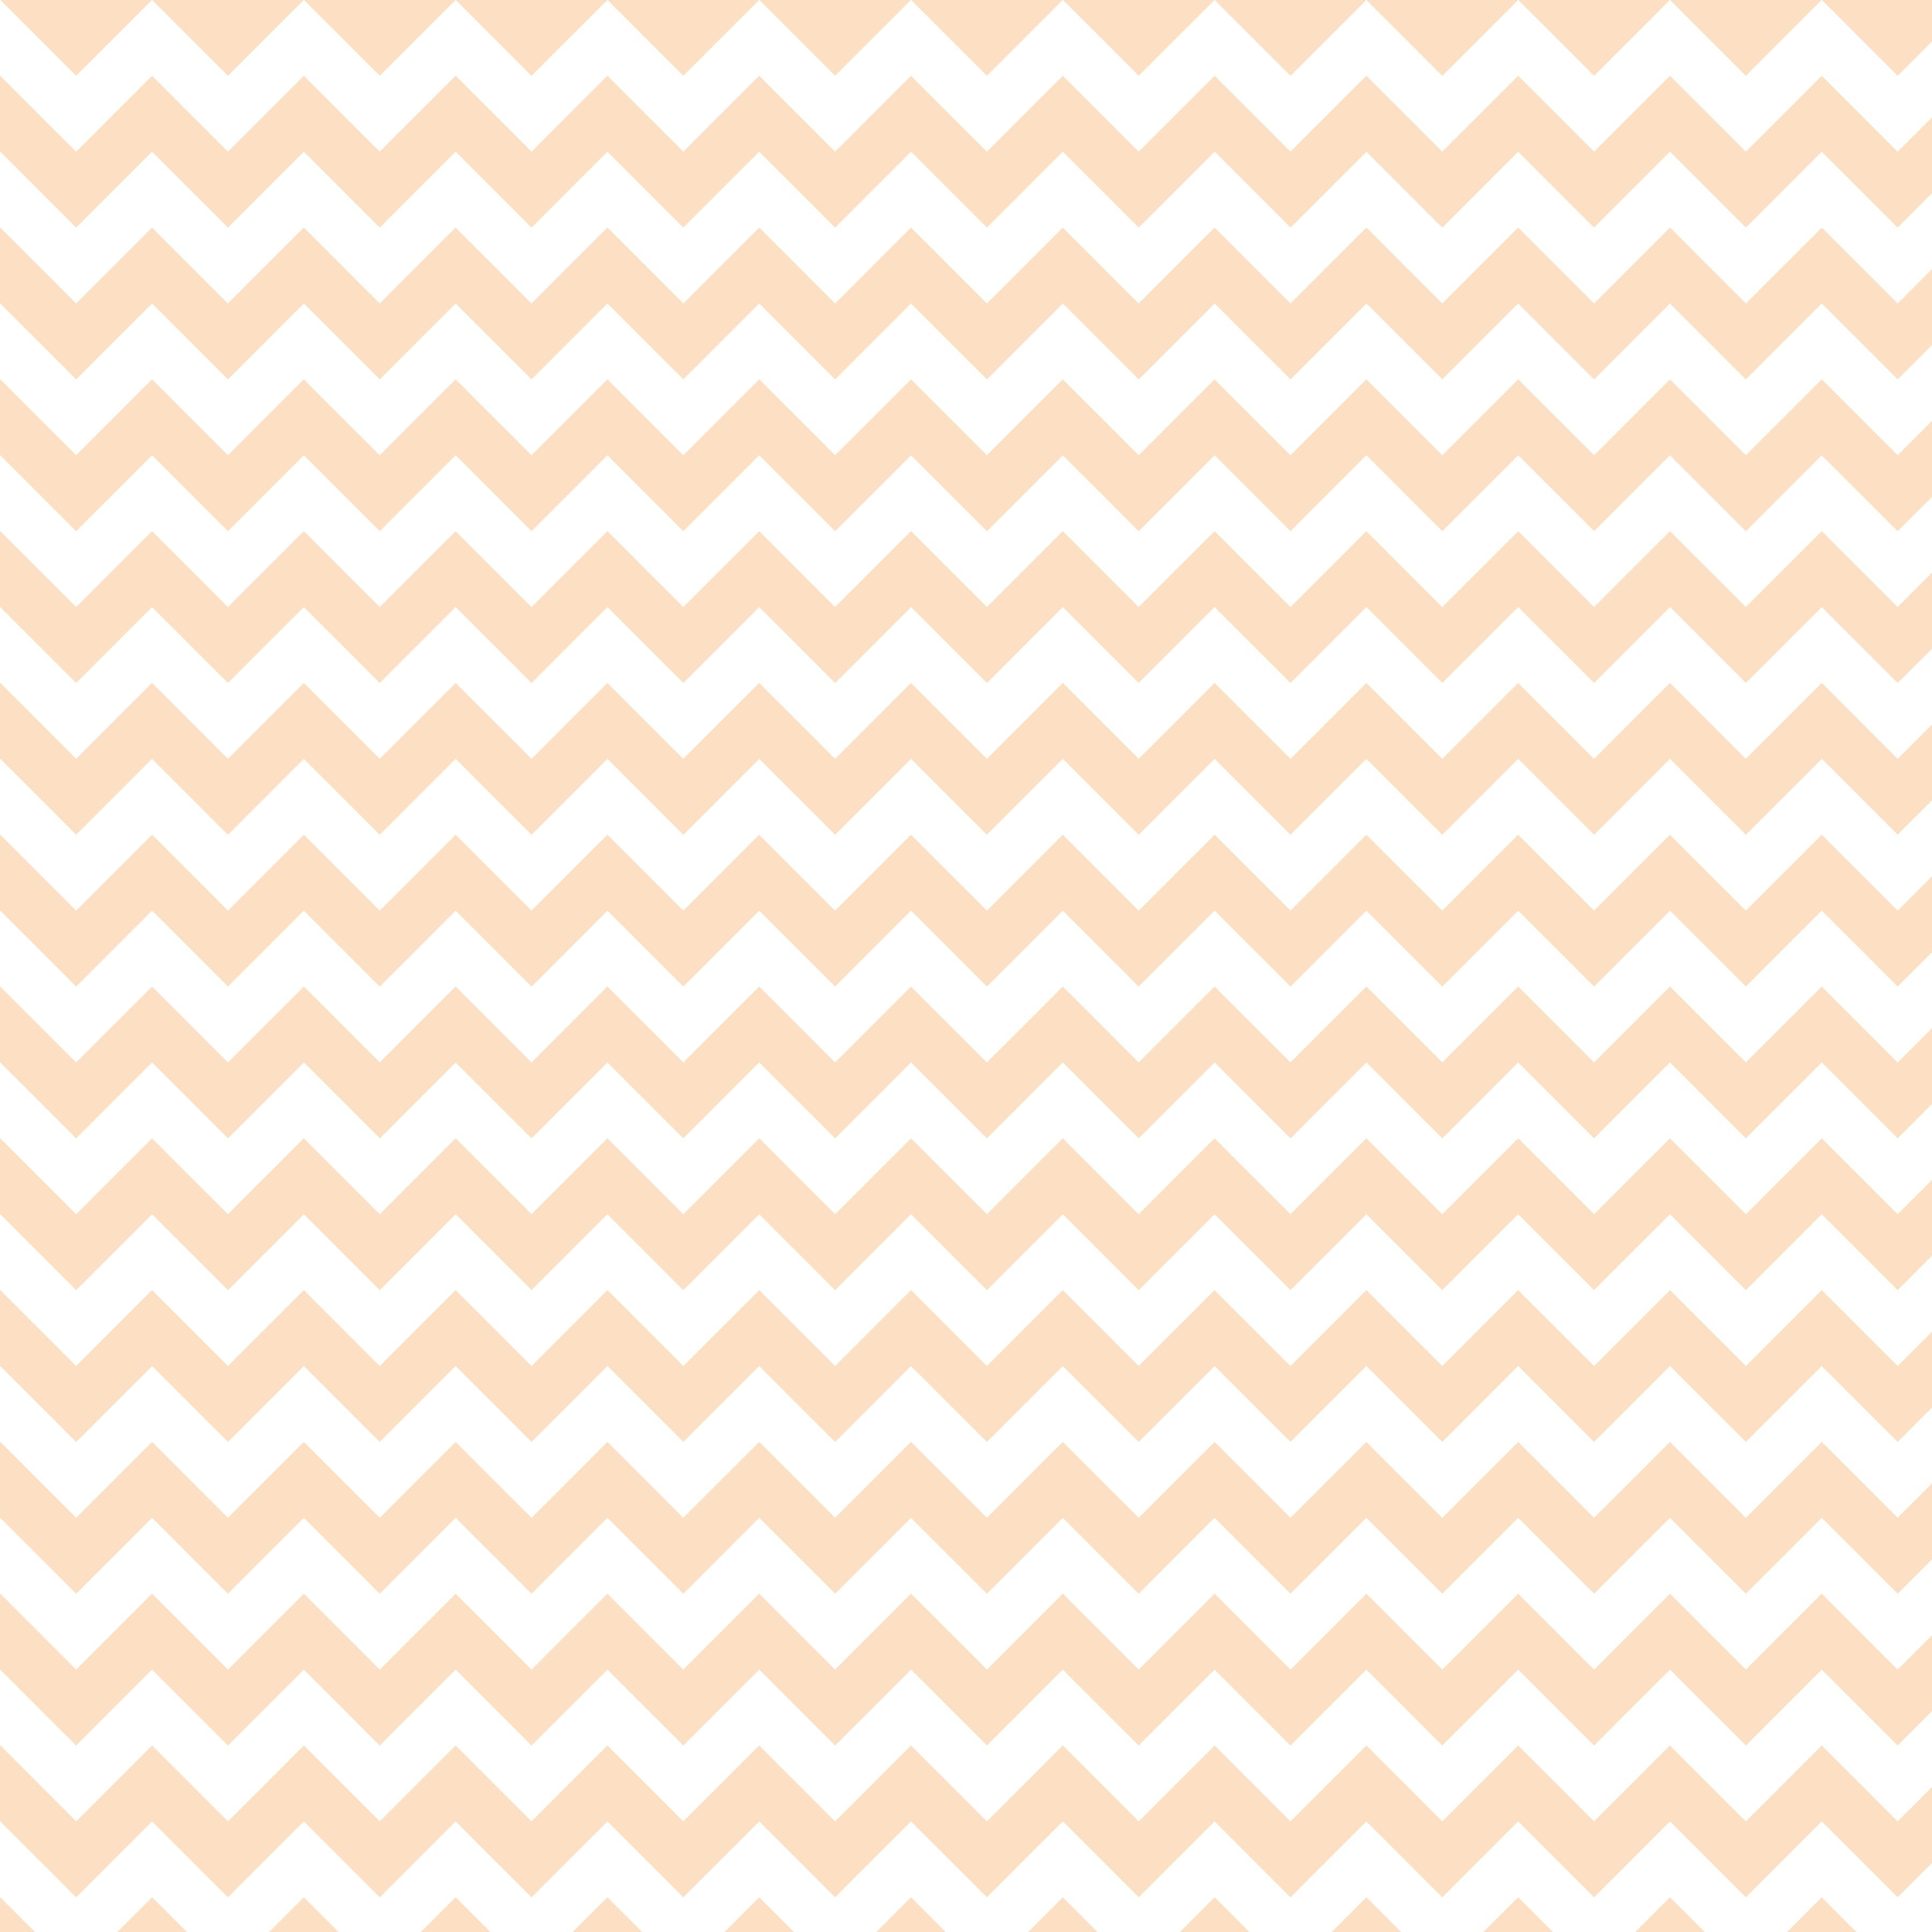 Pastel Chevron Digital Paper-Seamless example image 3